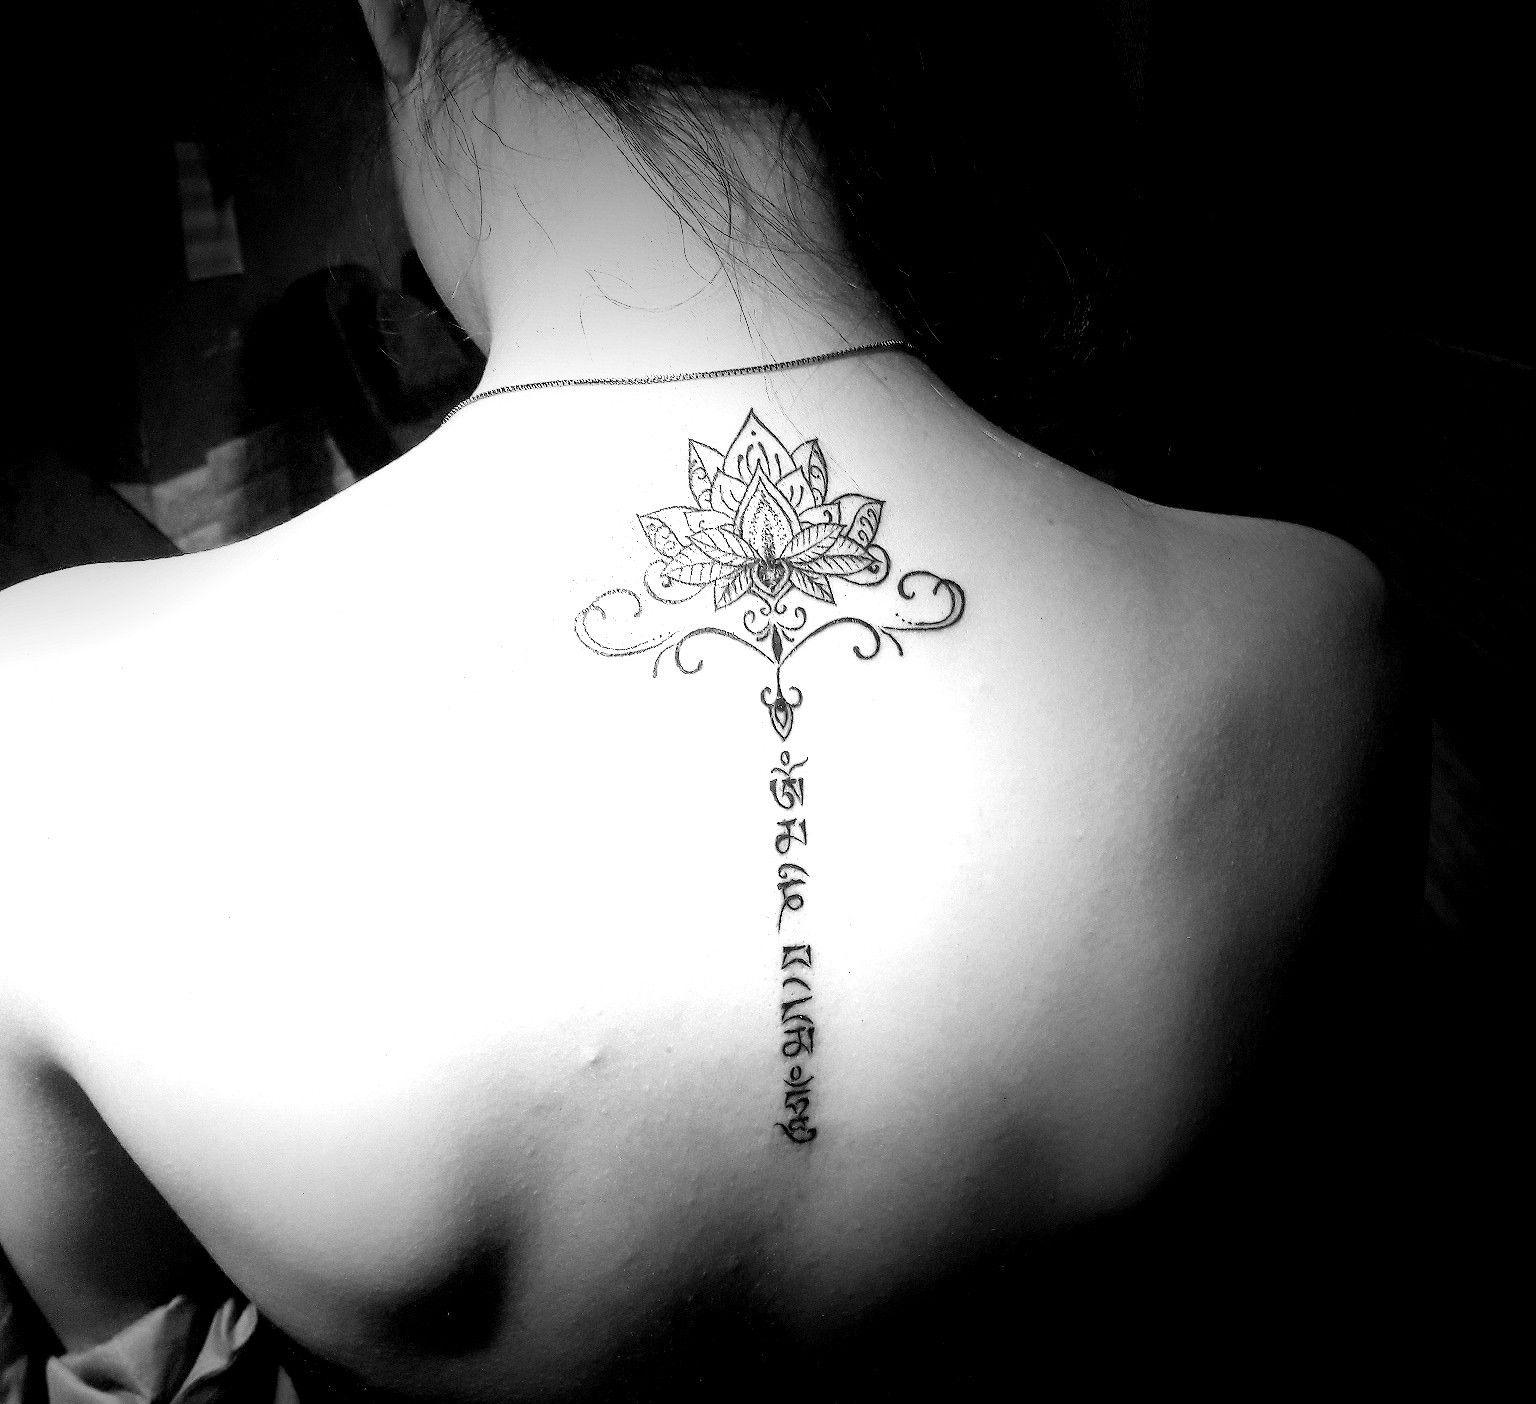 Neck Girl S Tara Mantra Tattoos: Om Mani Padme Hum Tattoo